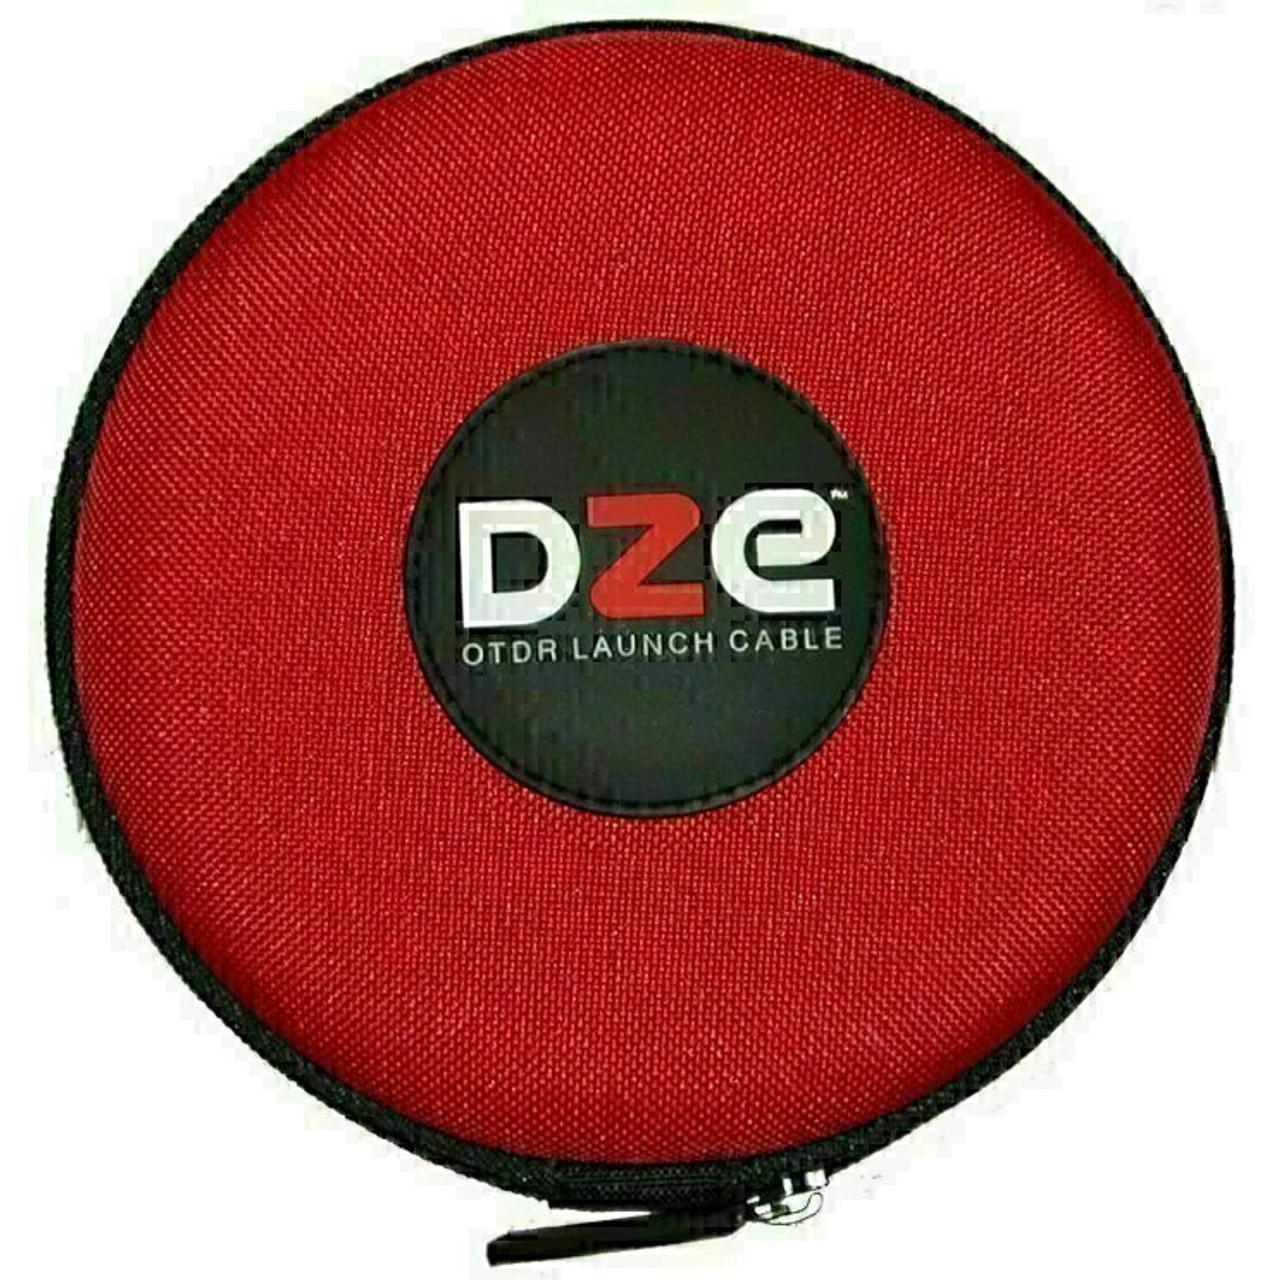 SC/APC - ST Series 3 DZE OTDR Launch Cable, 150 Meter Singlemode D352-S150